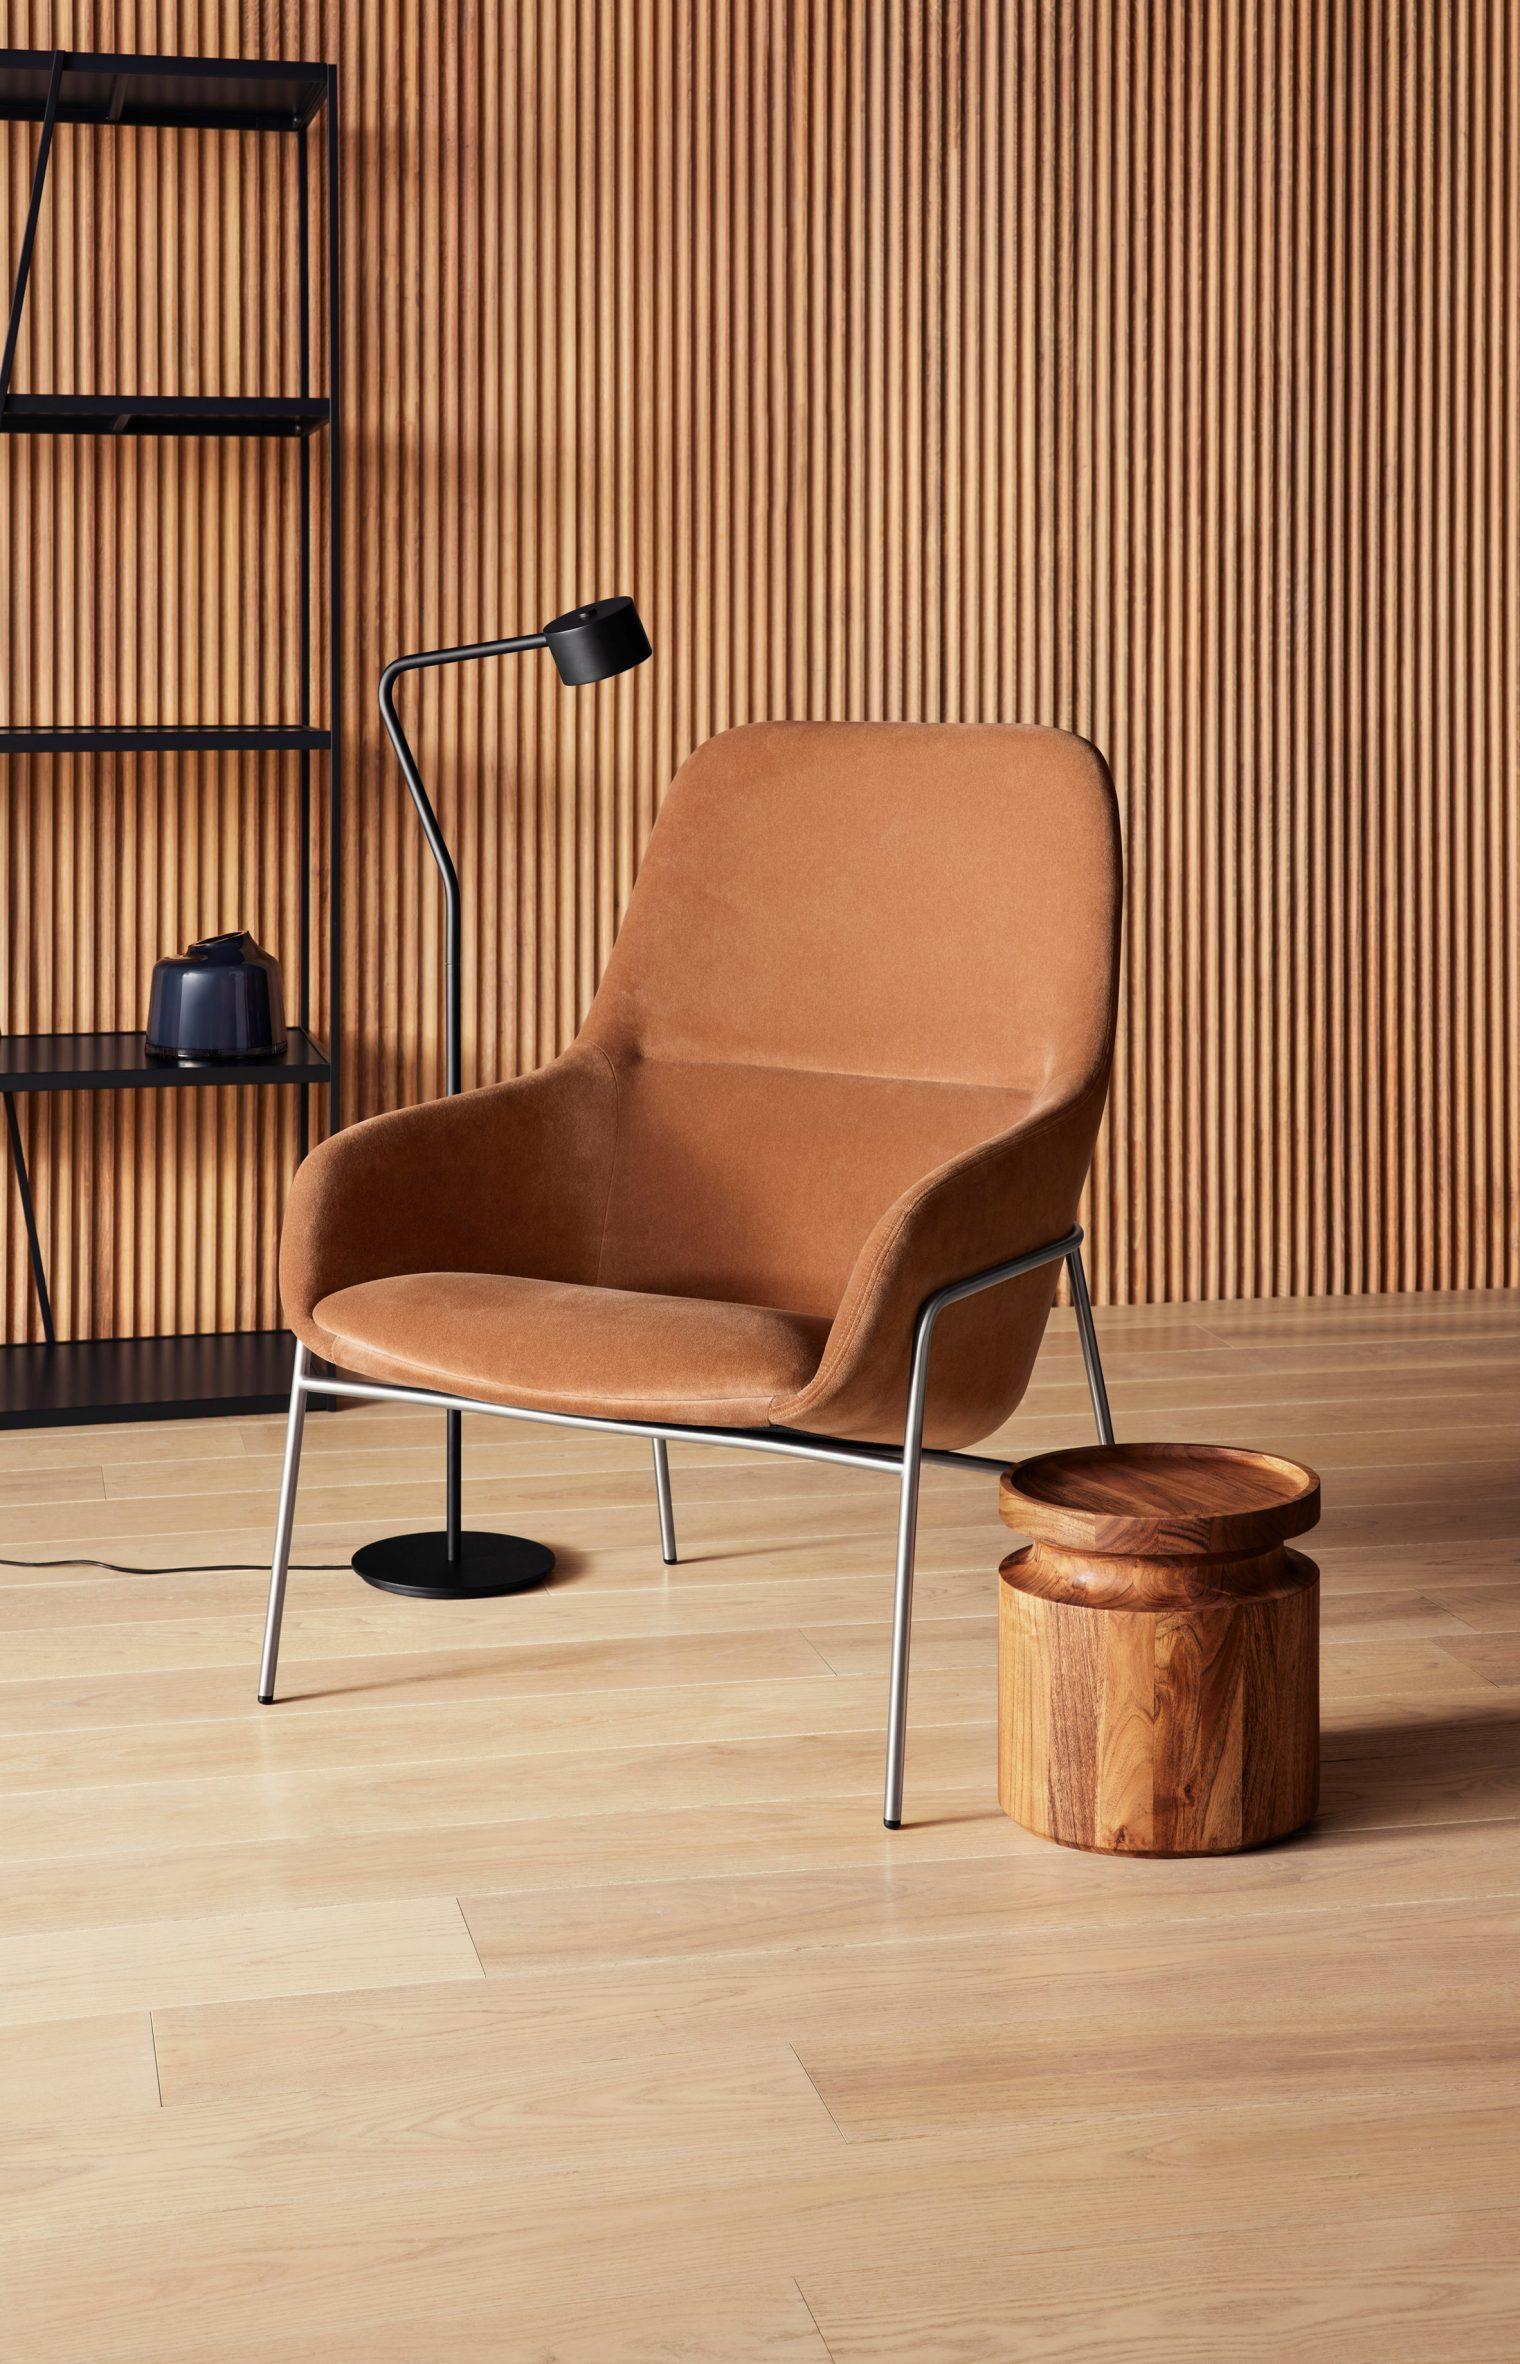 Acre Lounge Chair by Blu Dot in copper velvet